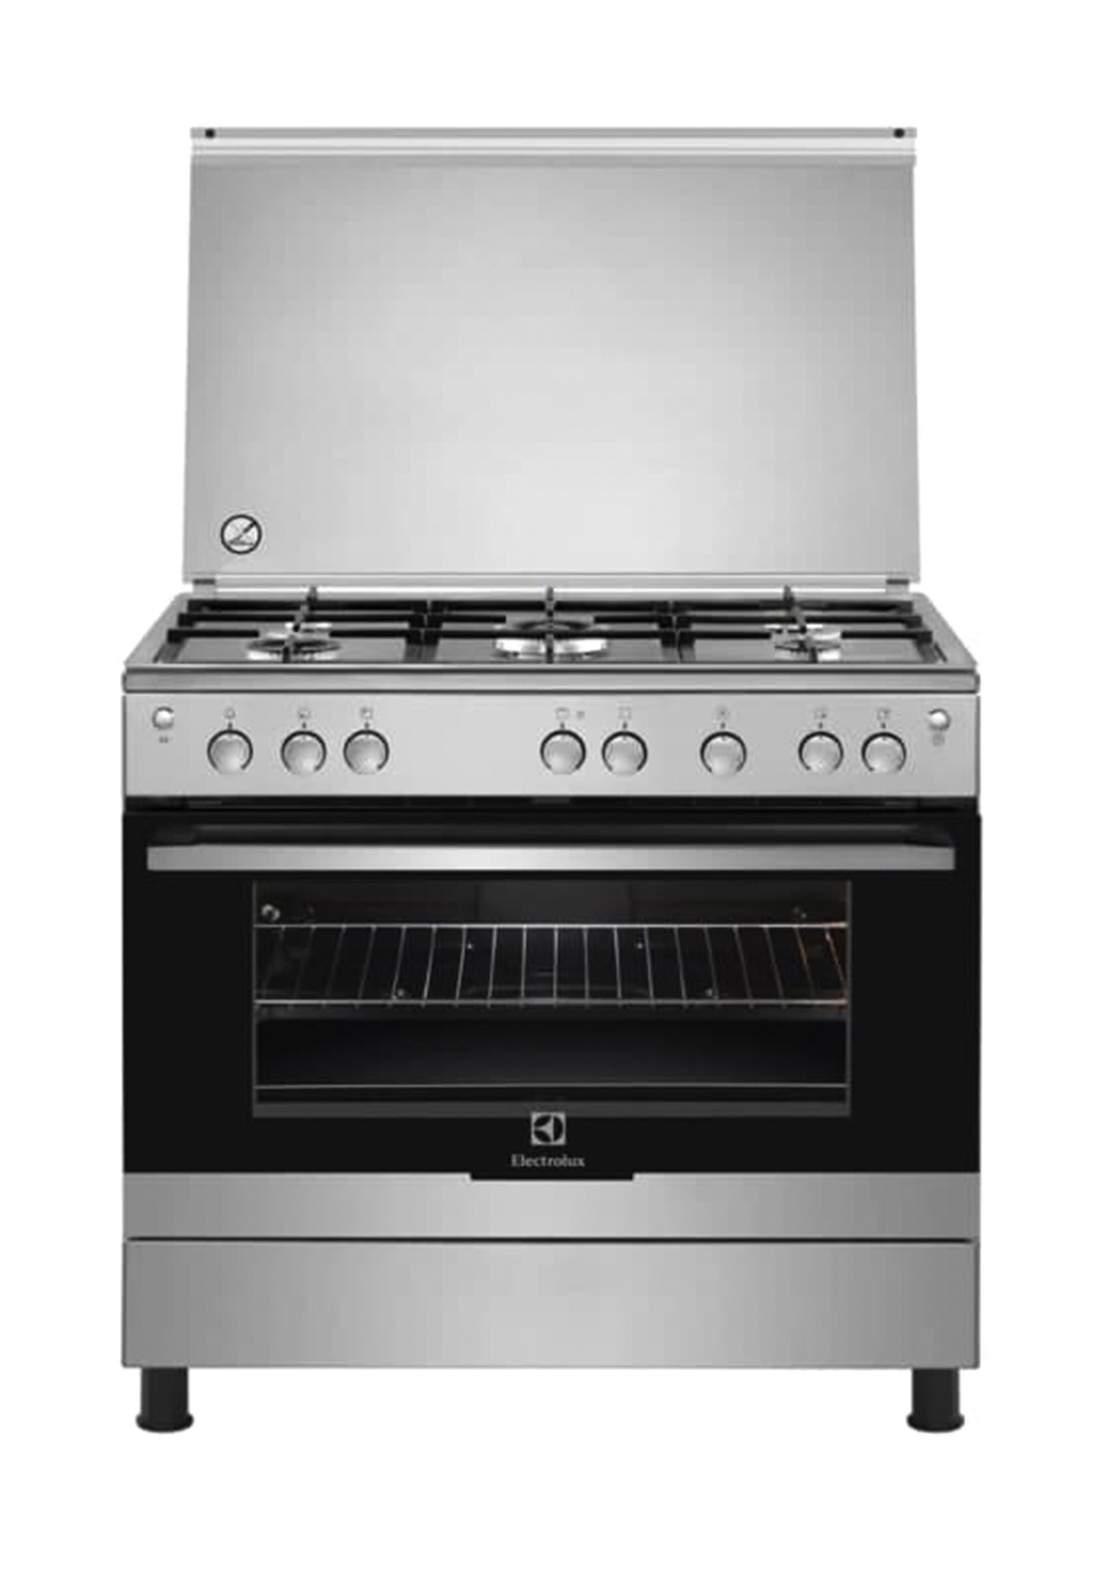 Electrolux EKG9000A4X 5 Burners Gas Cooker 90x60cm طباخ غازي